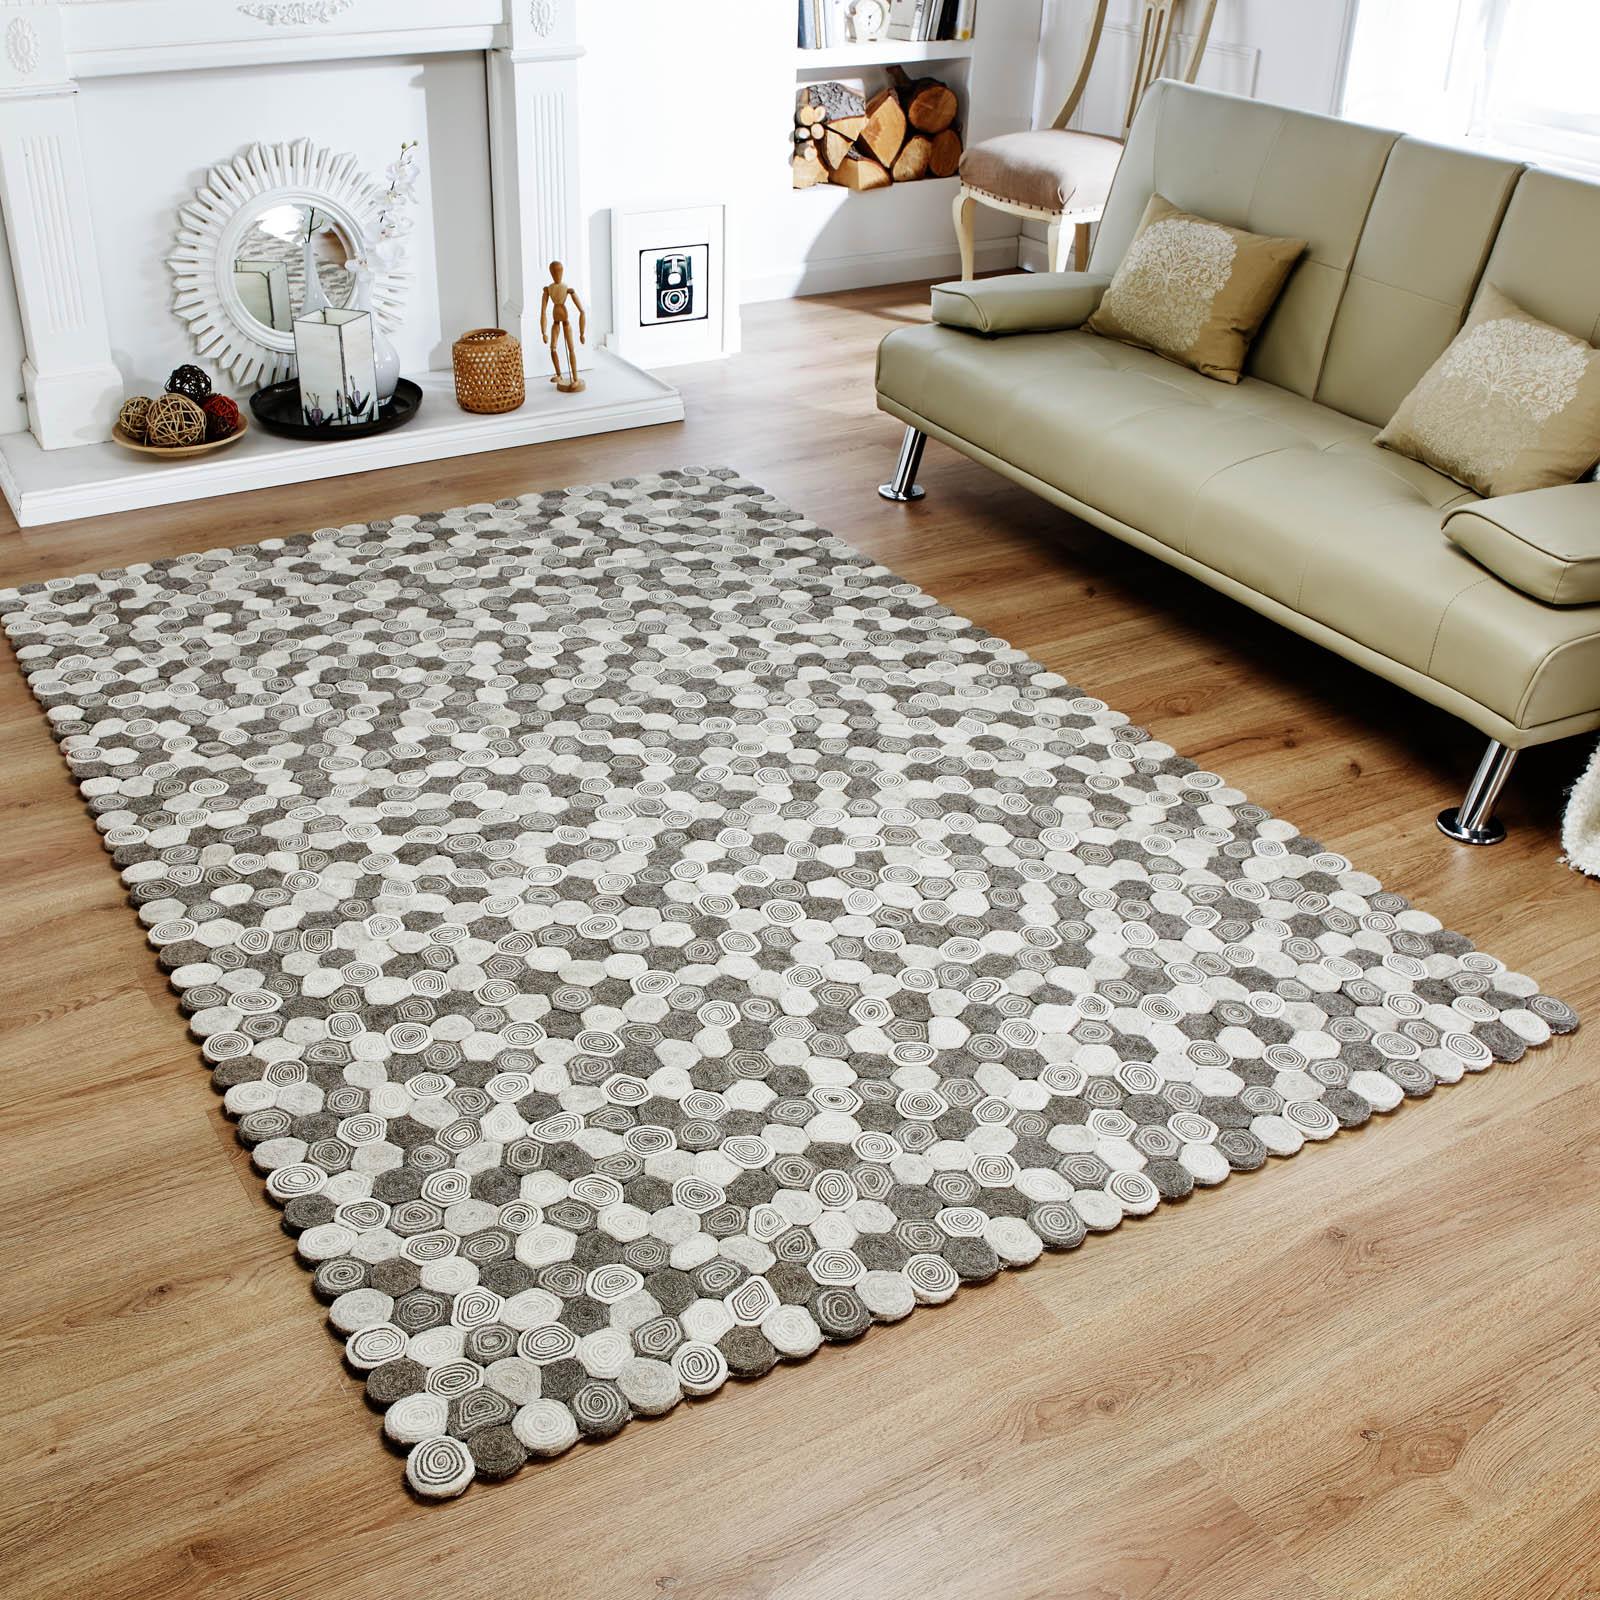 Lagom sushi rugs in monchrome